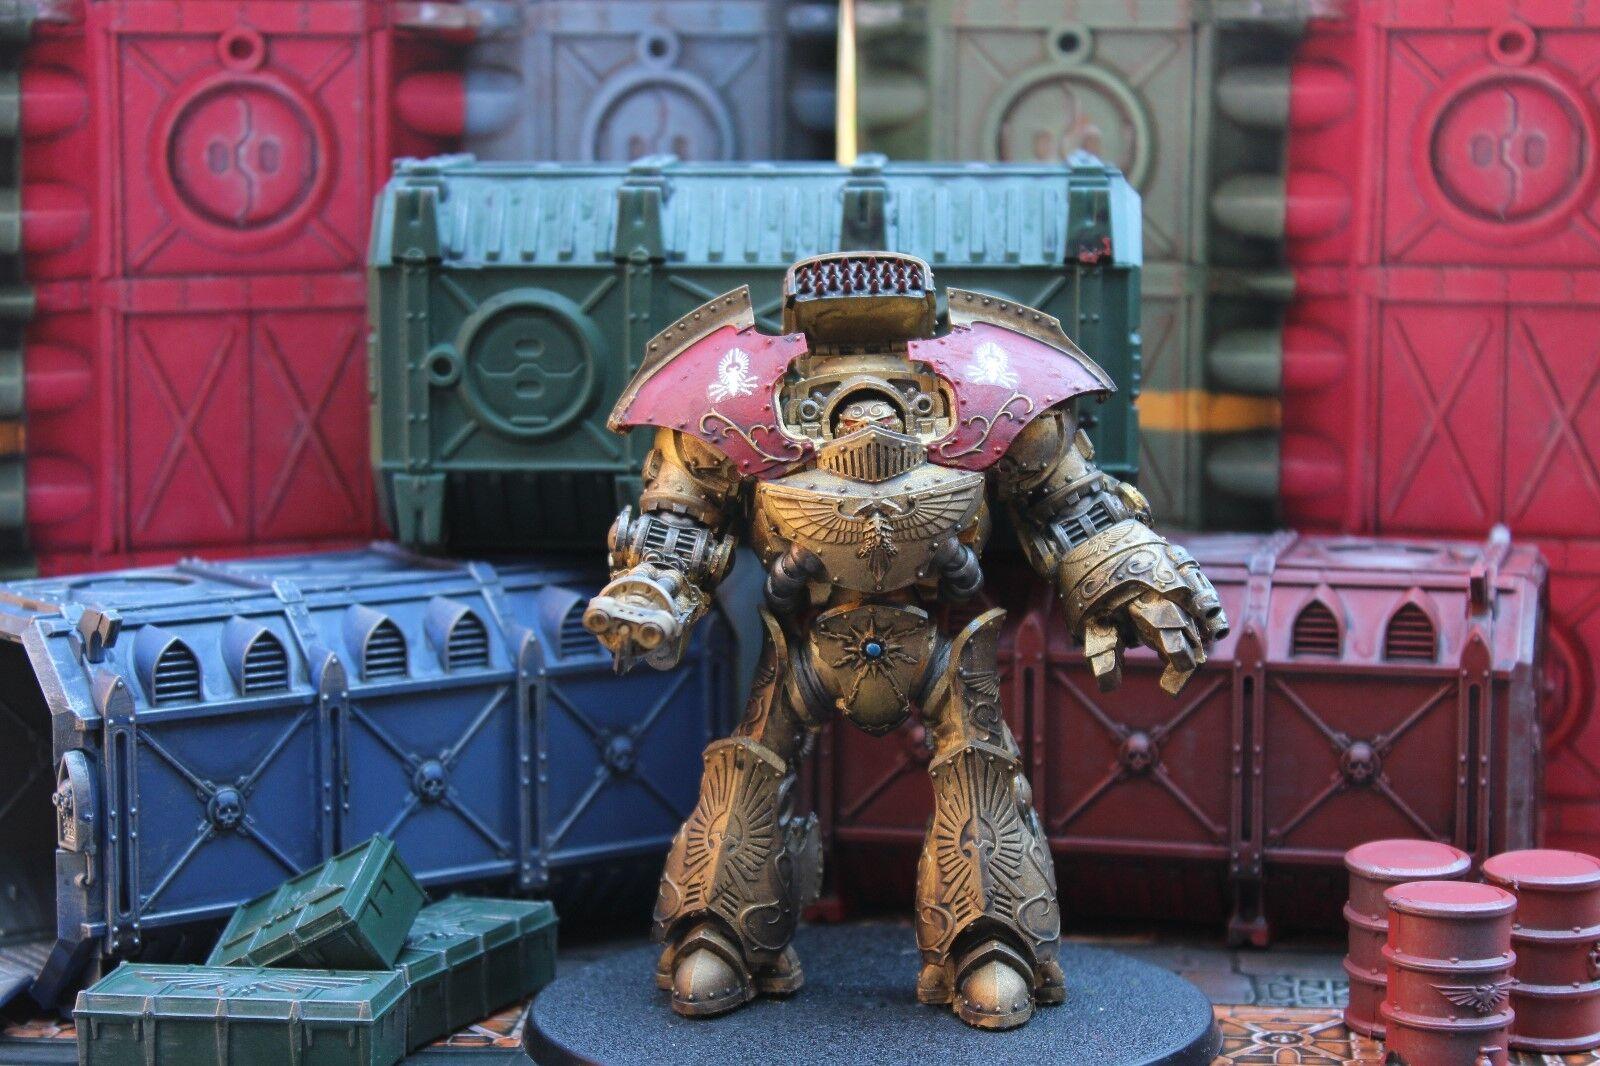 Warhammer forgeworld Legio Custodes Telemon dreadnought + 2 weapon arms